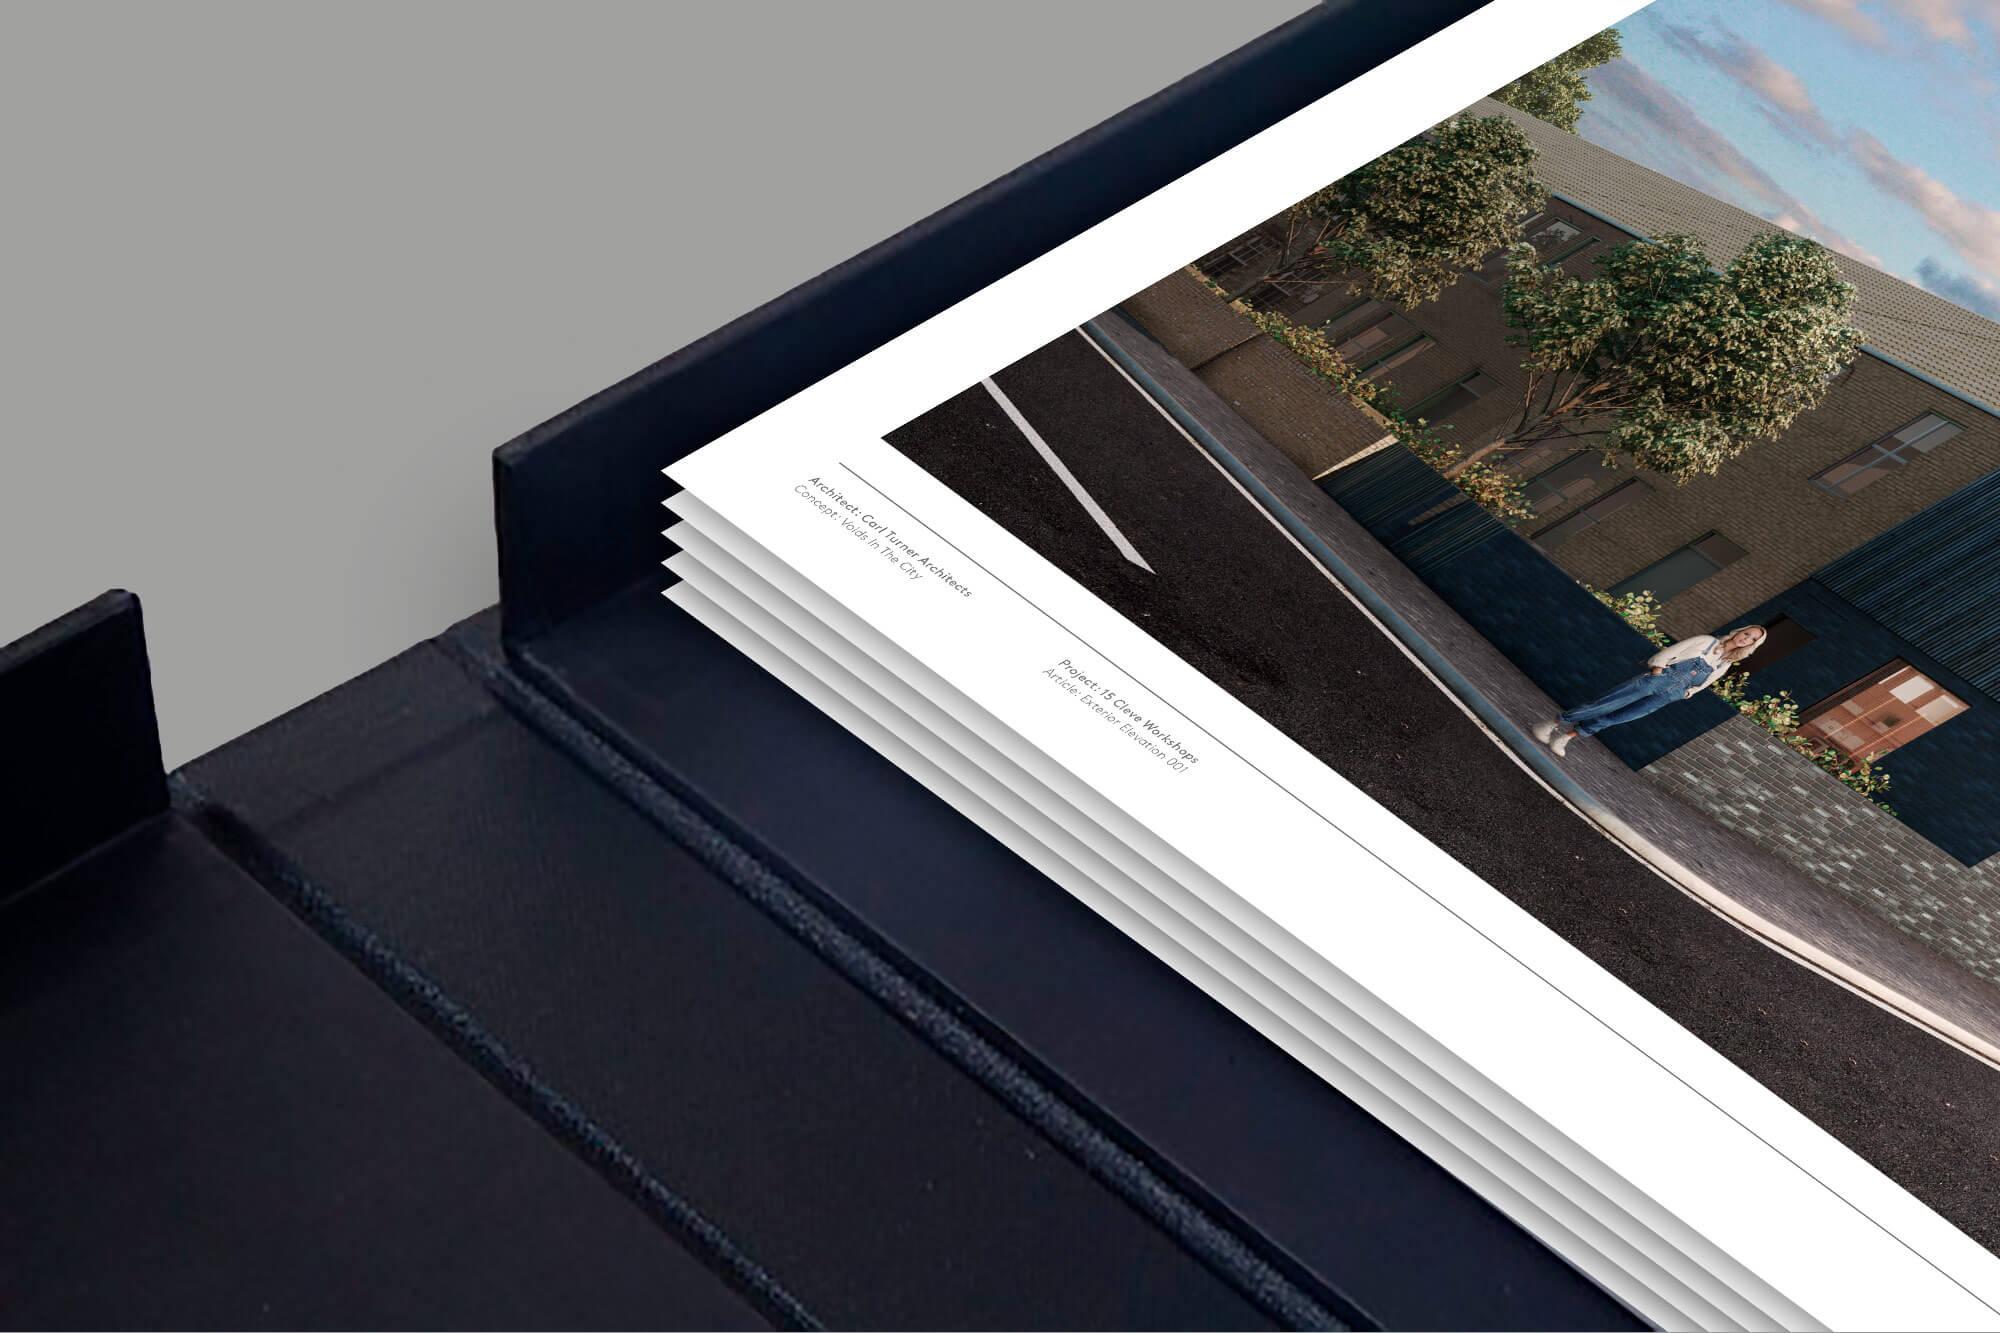 gpj-studio-cube-haus-architects-website-cs-09